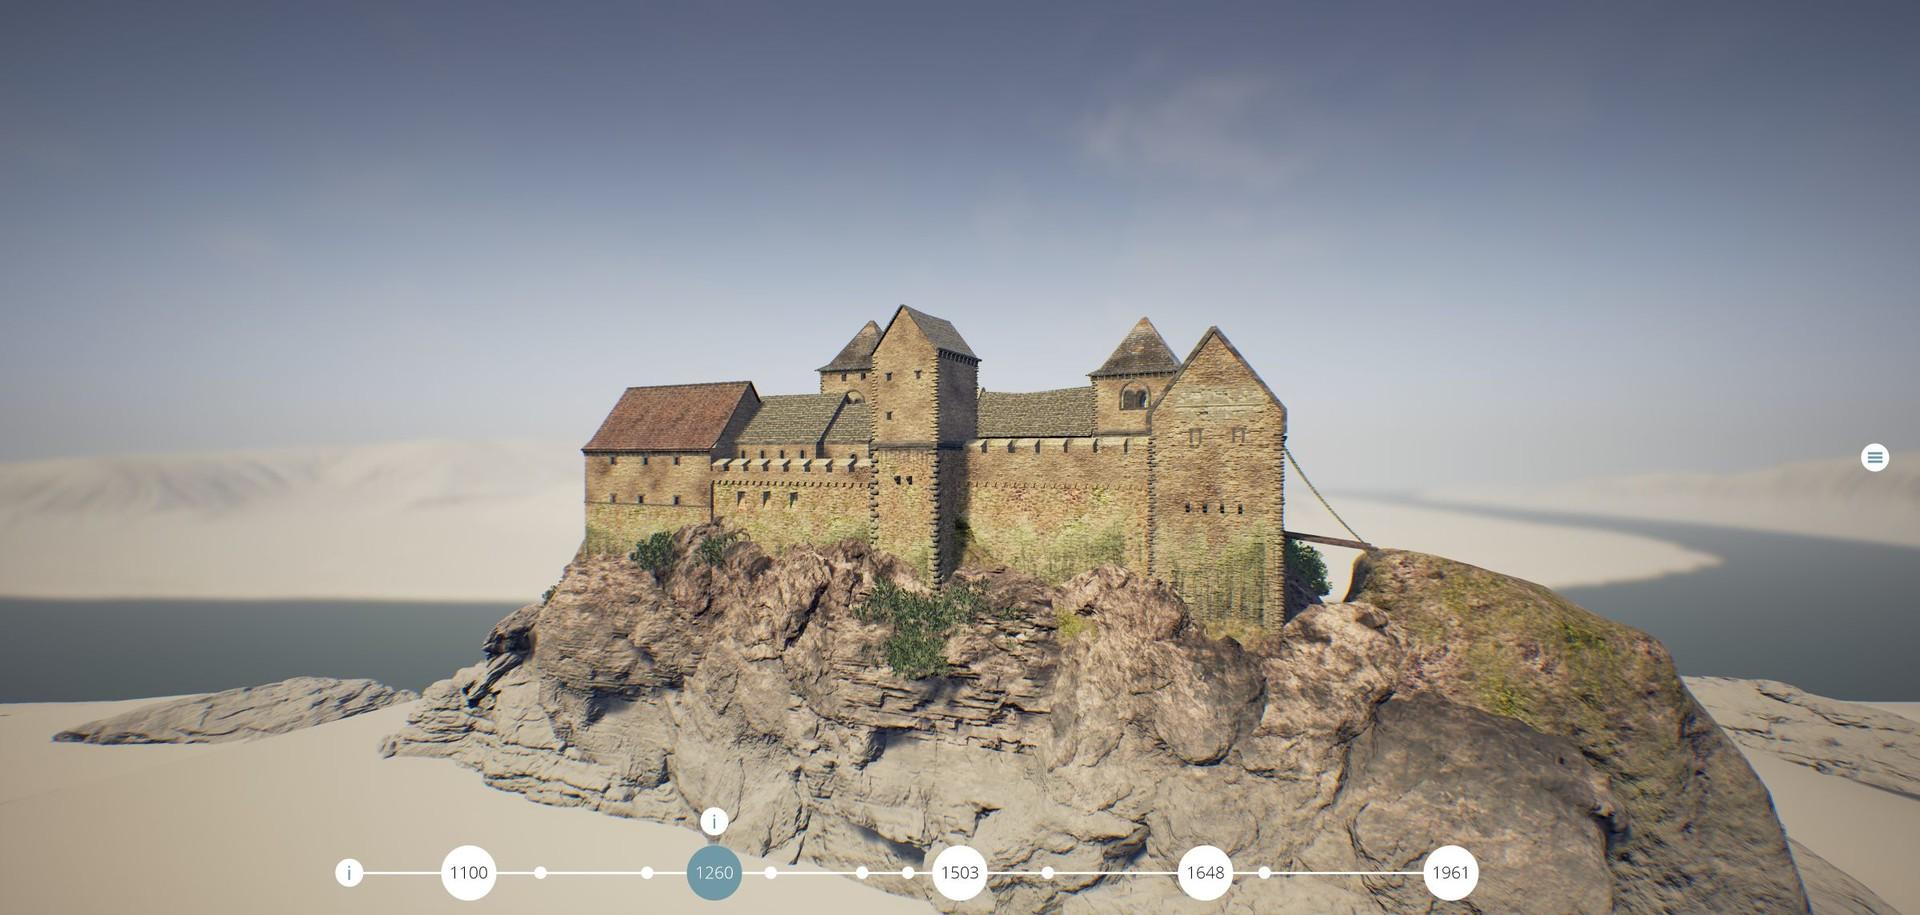 the Romanesque period